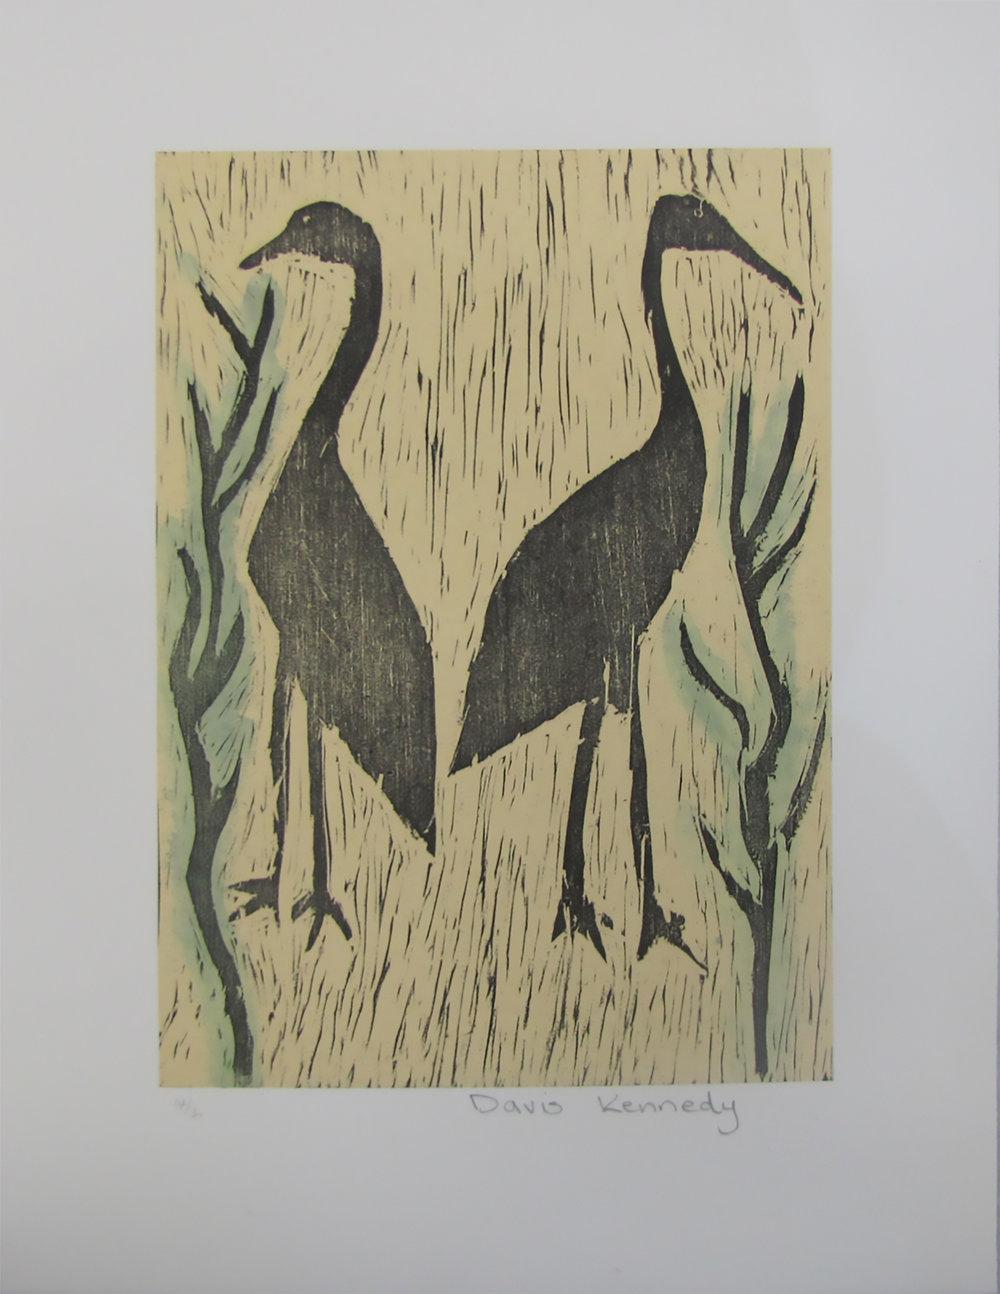 Davis Kennedy, Birds. 2013 Woodcut. Exhibition Proof   30 x 21 cm. $220 unframed.  Editions 12/30, 13/30, 14/30 & 16/30 (unframed) available